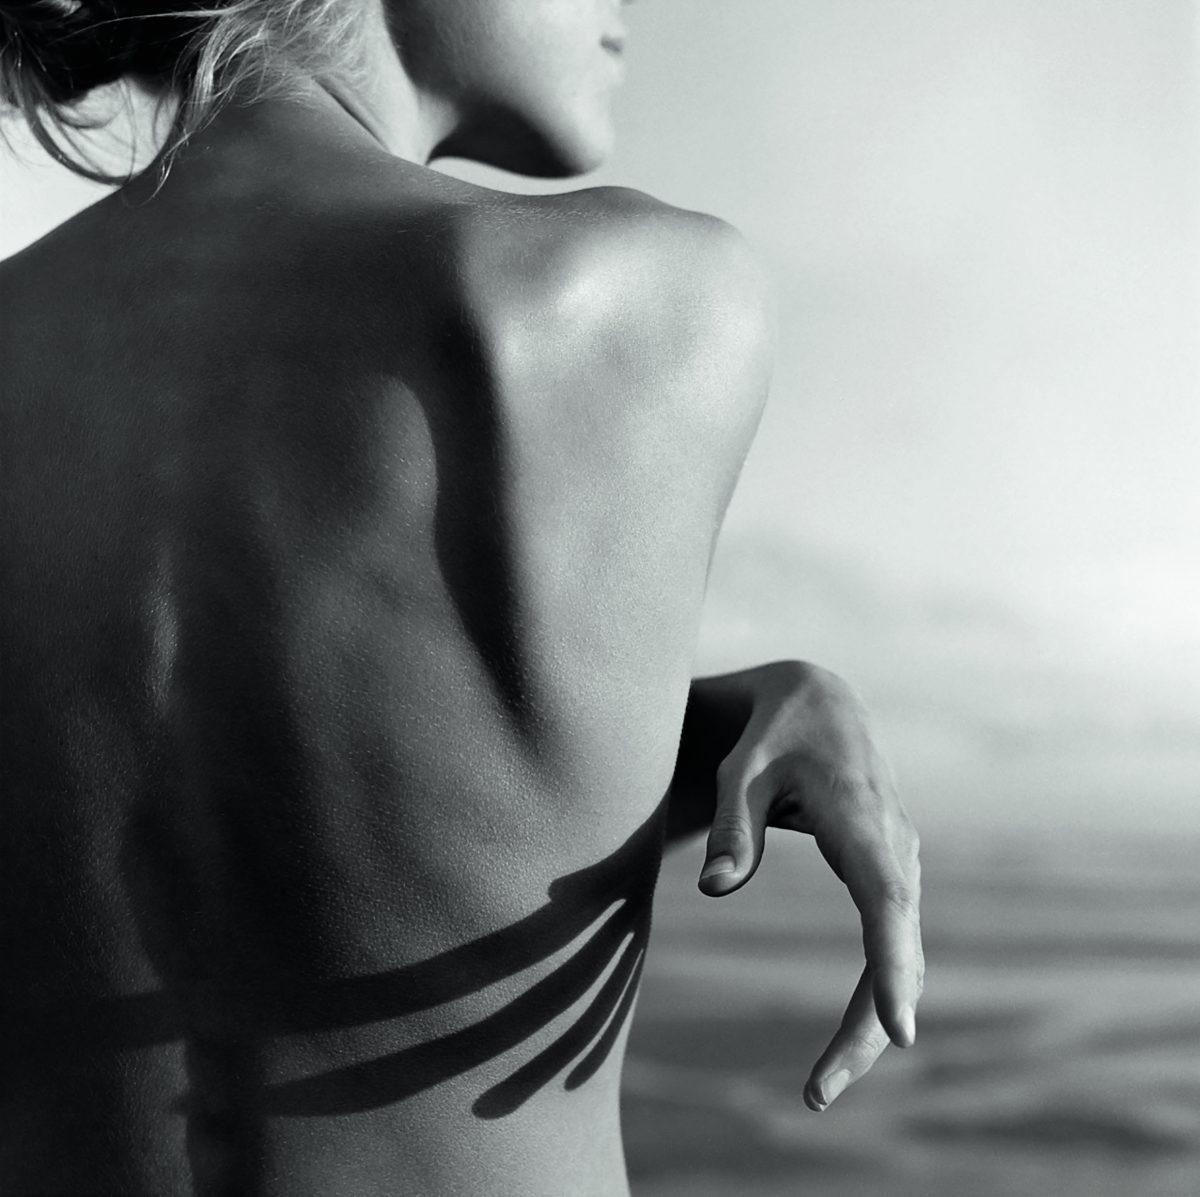 Sombra, 1999. © 2021 Mona Kuhn